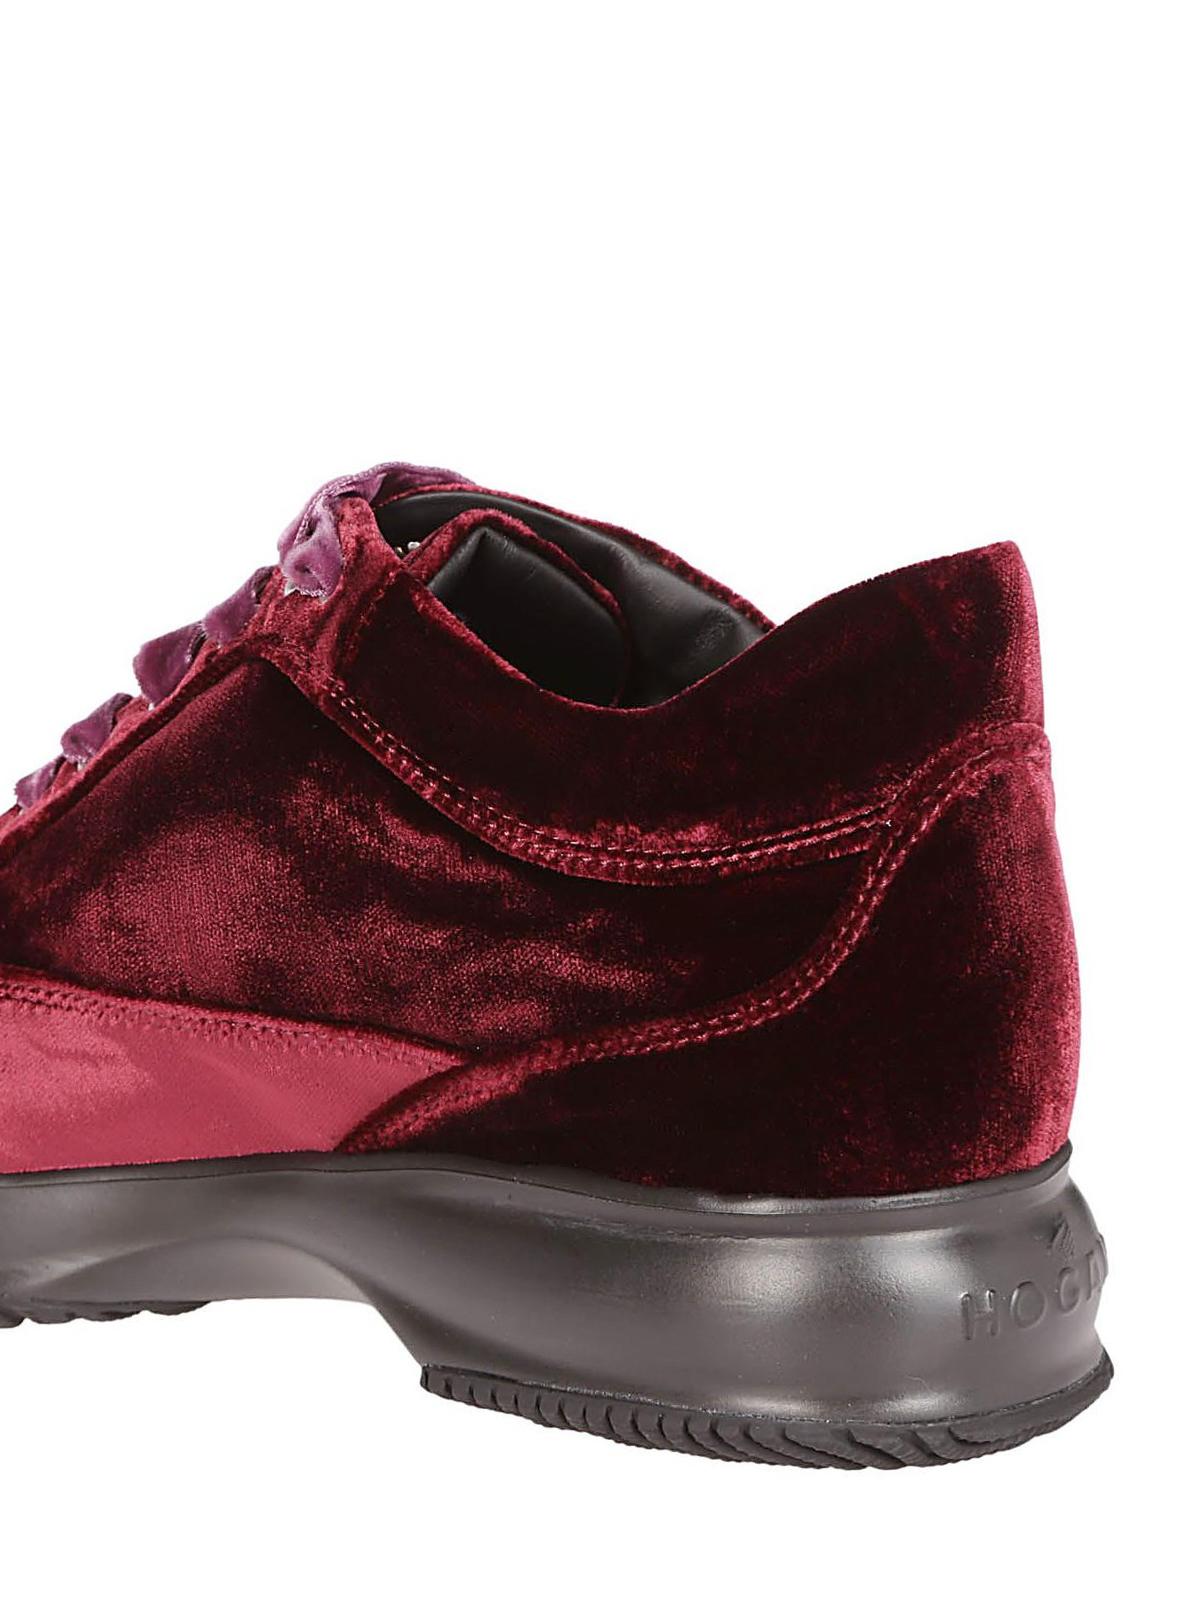 Sneakers Hogan - Interactive in velluto bordeaux con strass ...